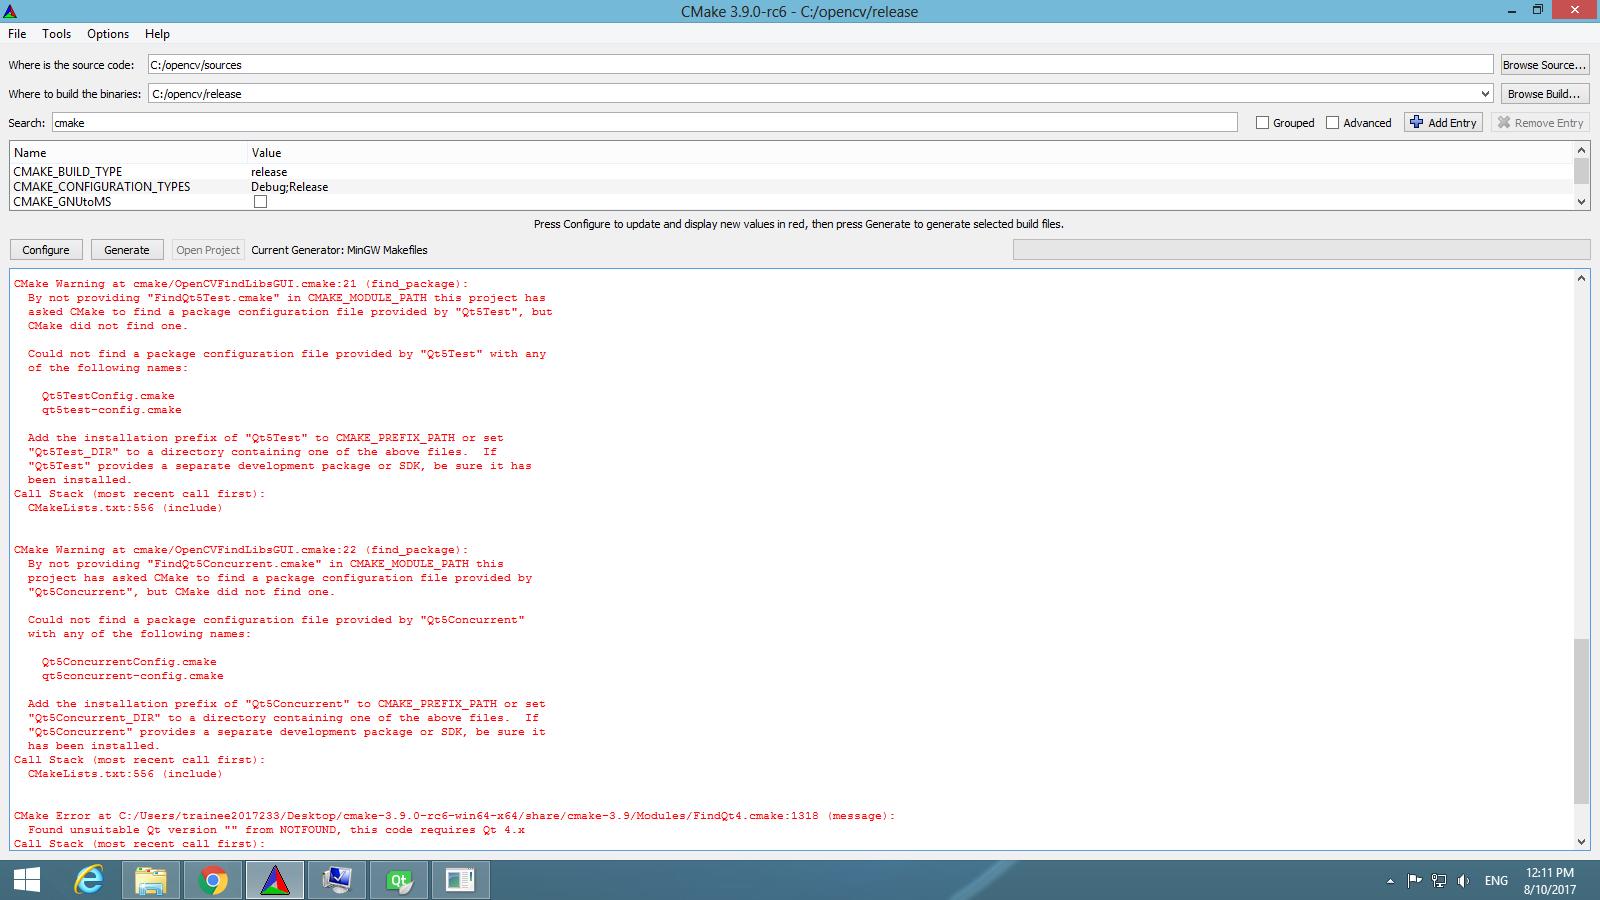 0_1502347280180_Screenshot (8).png